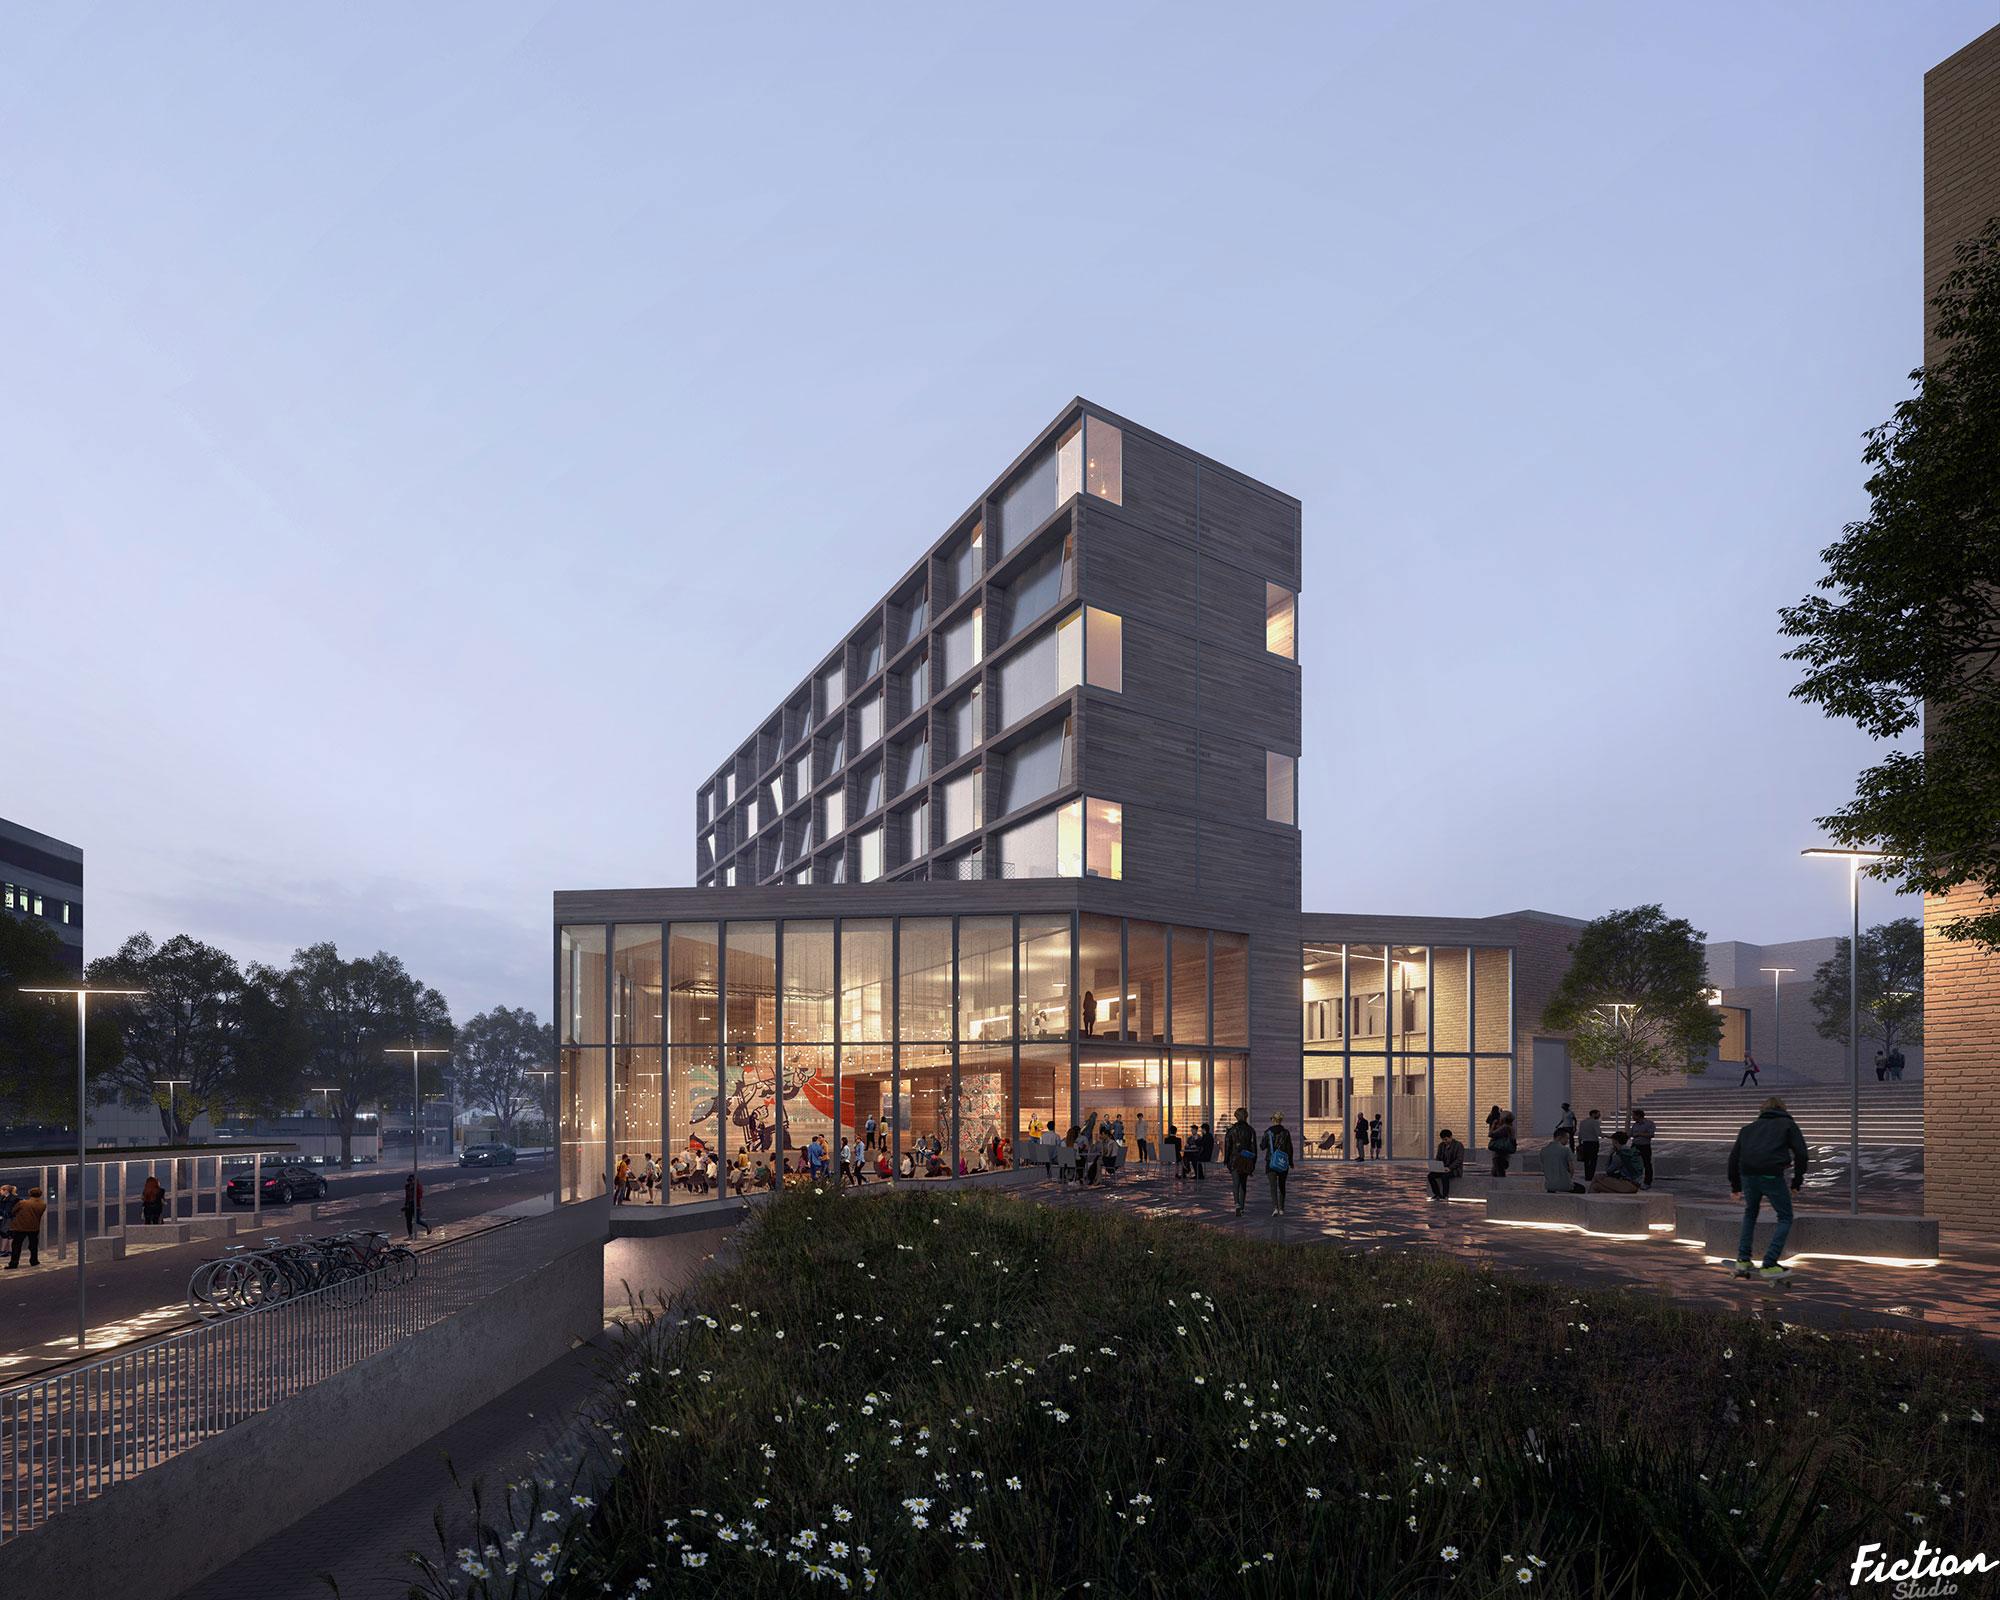 WINNING PROJECT! - 3rw - Innovation hub - Norway